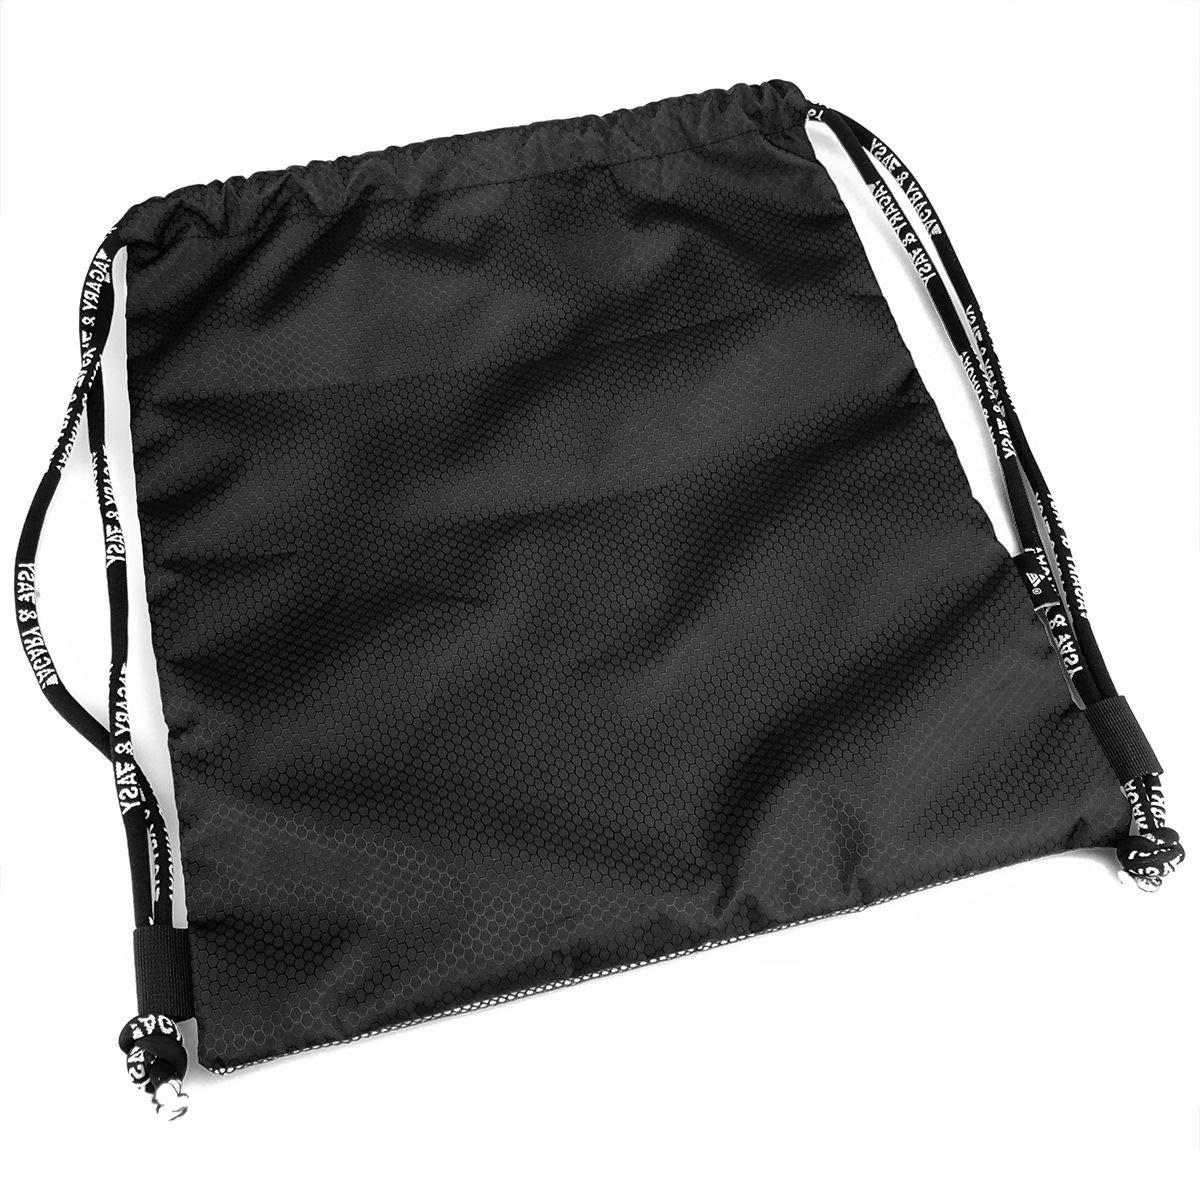 Presidents Day Drawstring Bag For Men /& Women Large /& Waterproof Gymsack Sackpack Backpack Cinch Sack For School Gym Travel